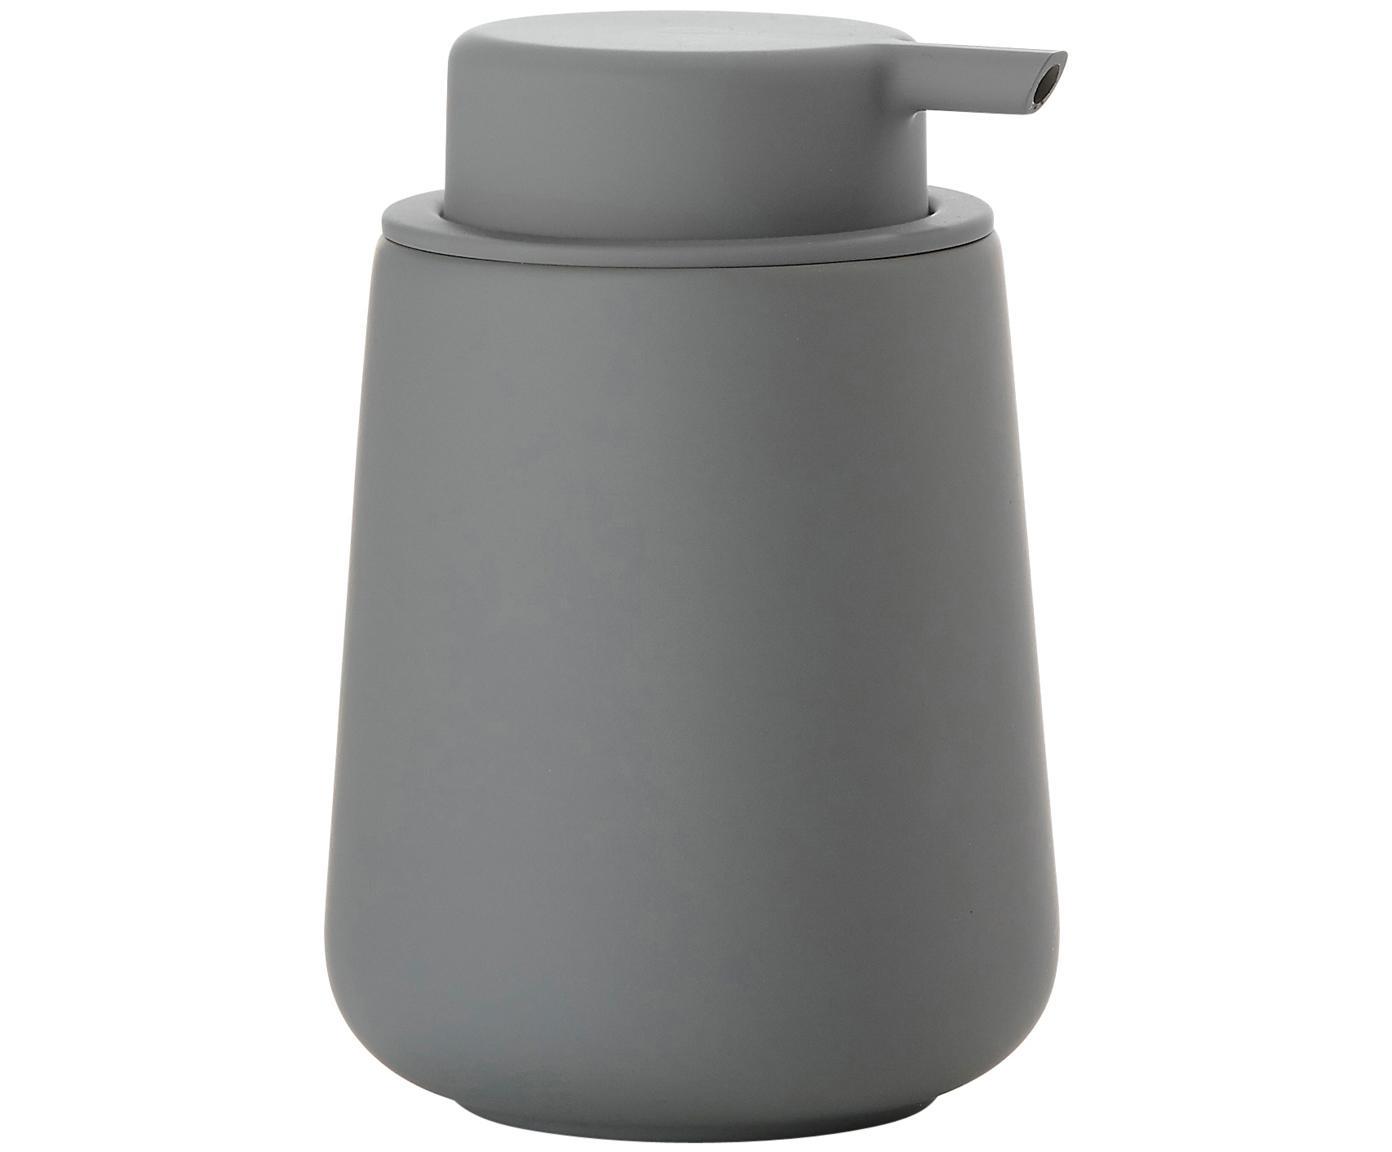 Porzellan-Seifenspender Nova One, Behälter: Porzellan, Grau, matt, Ø 8 x H 12 cm